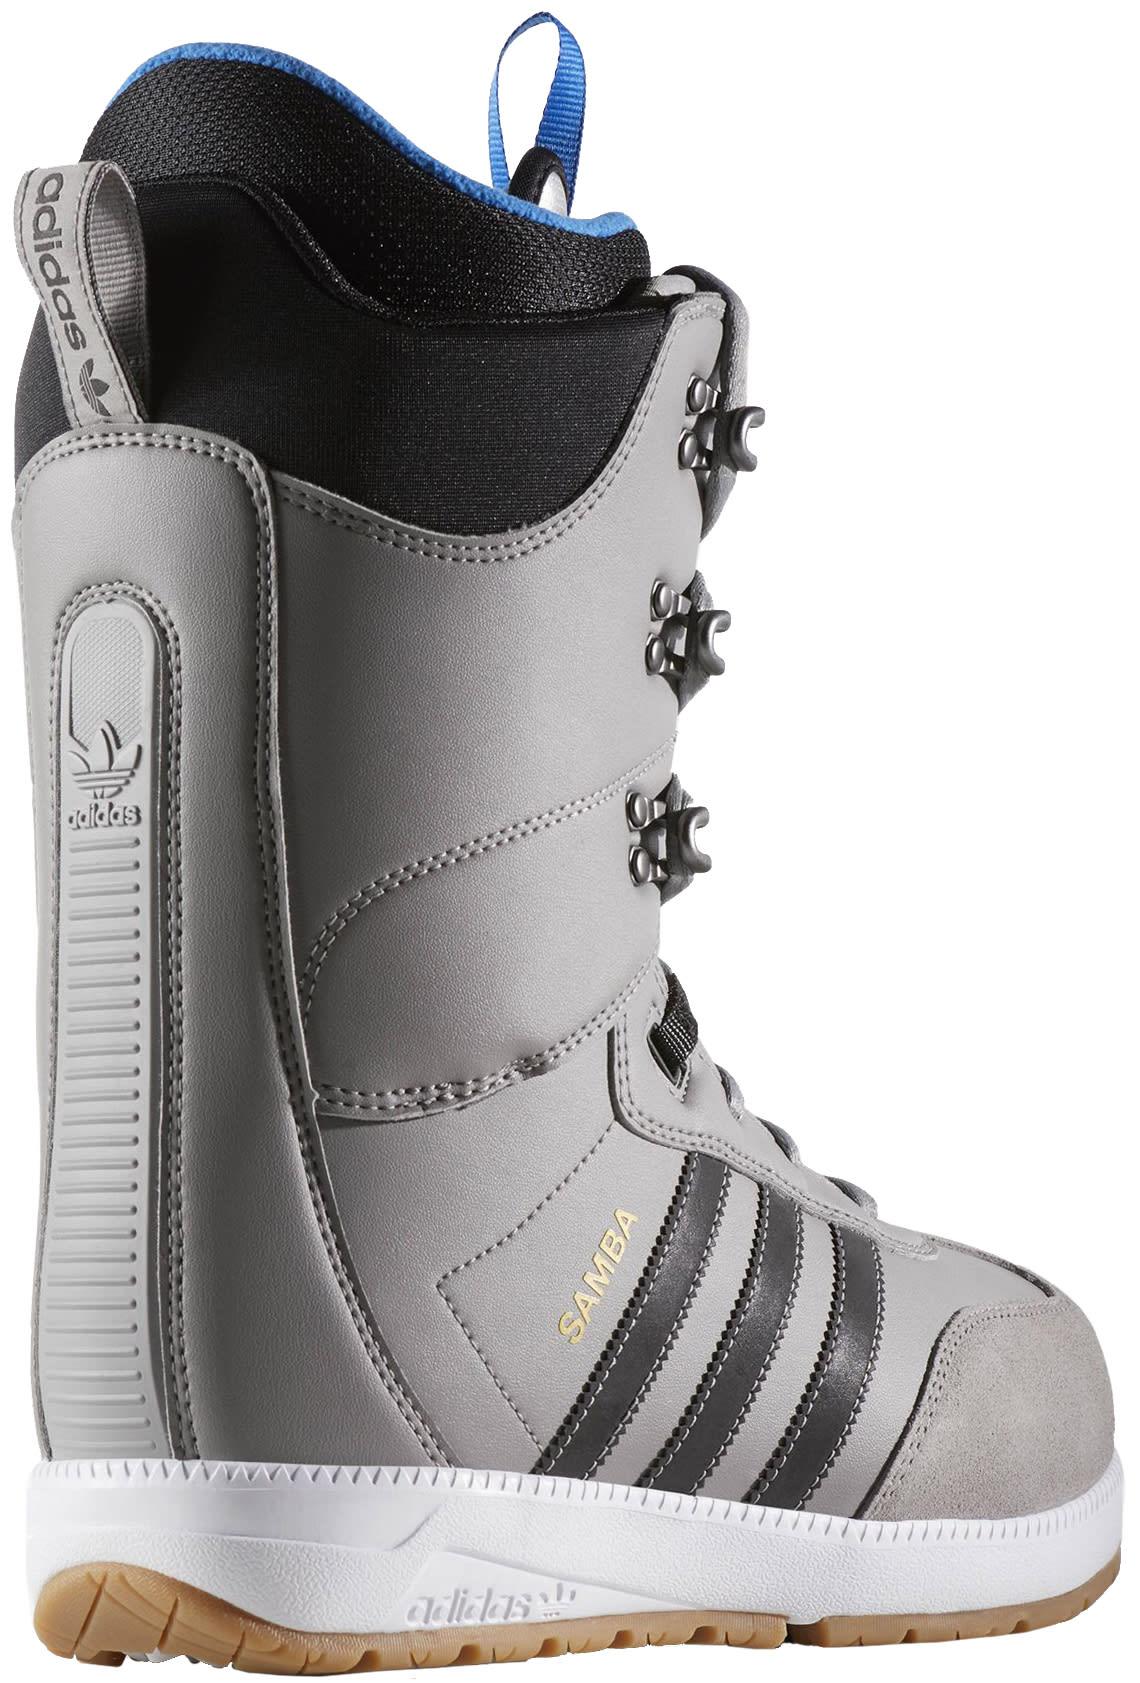 e834f7bd5ce9 Adidas Samba Adv Snowboard Boots - thumbnail 3